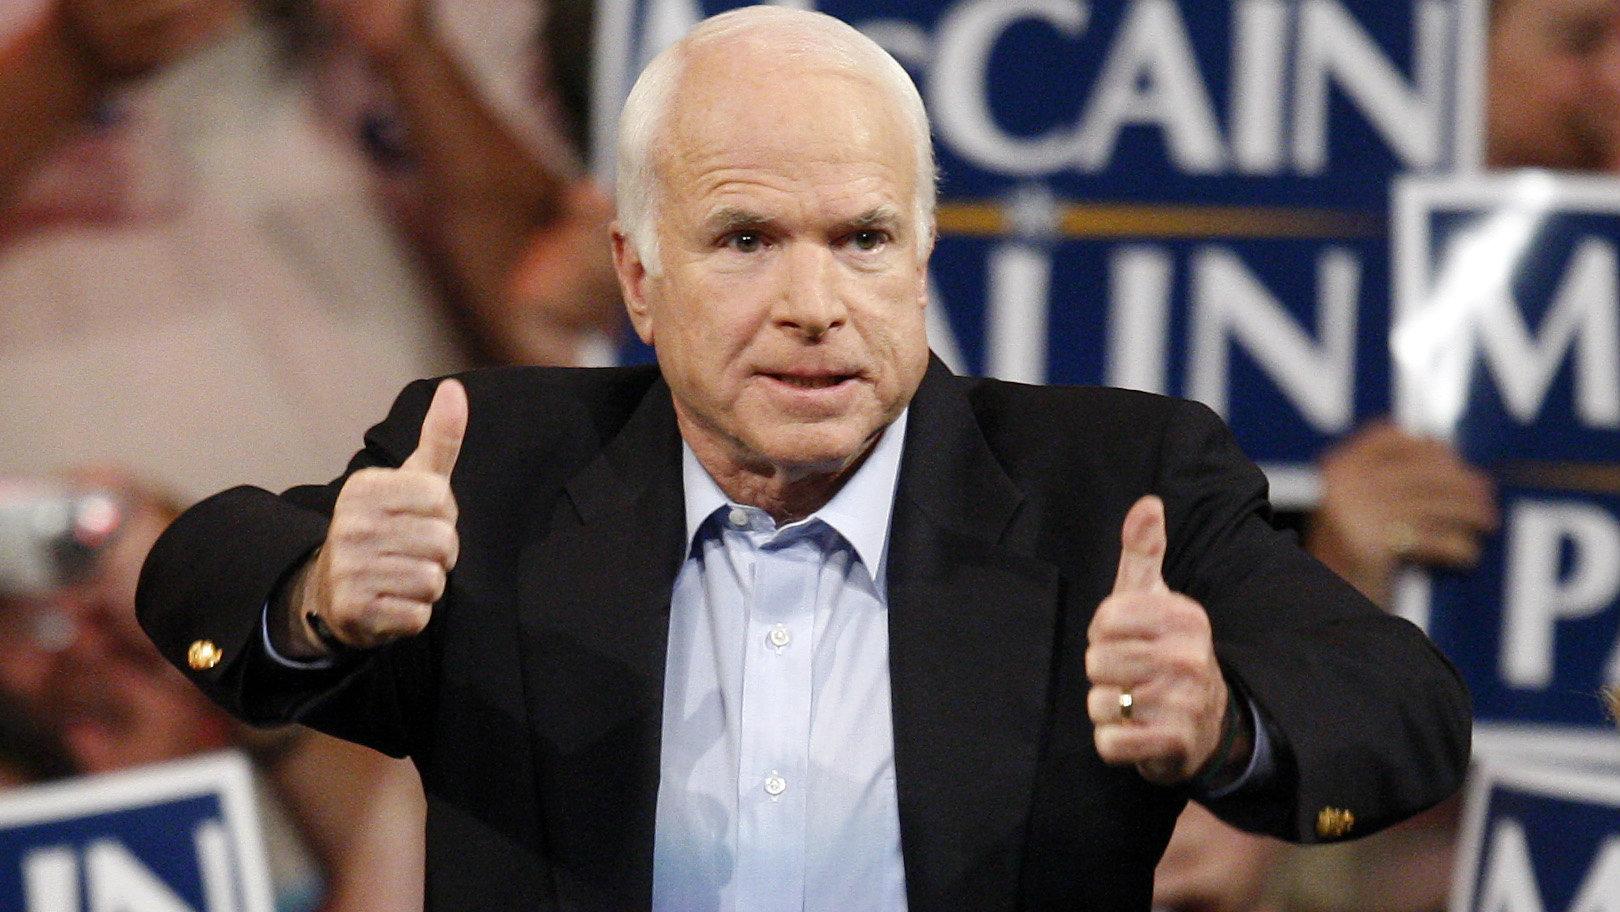 John McCain giving thumbs up.